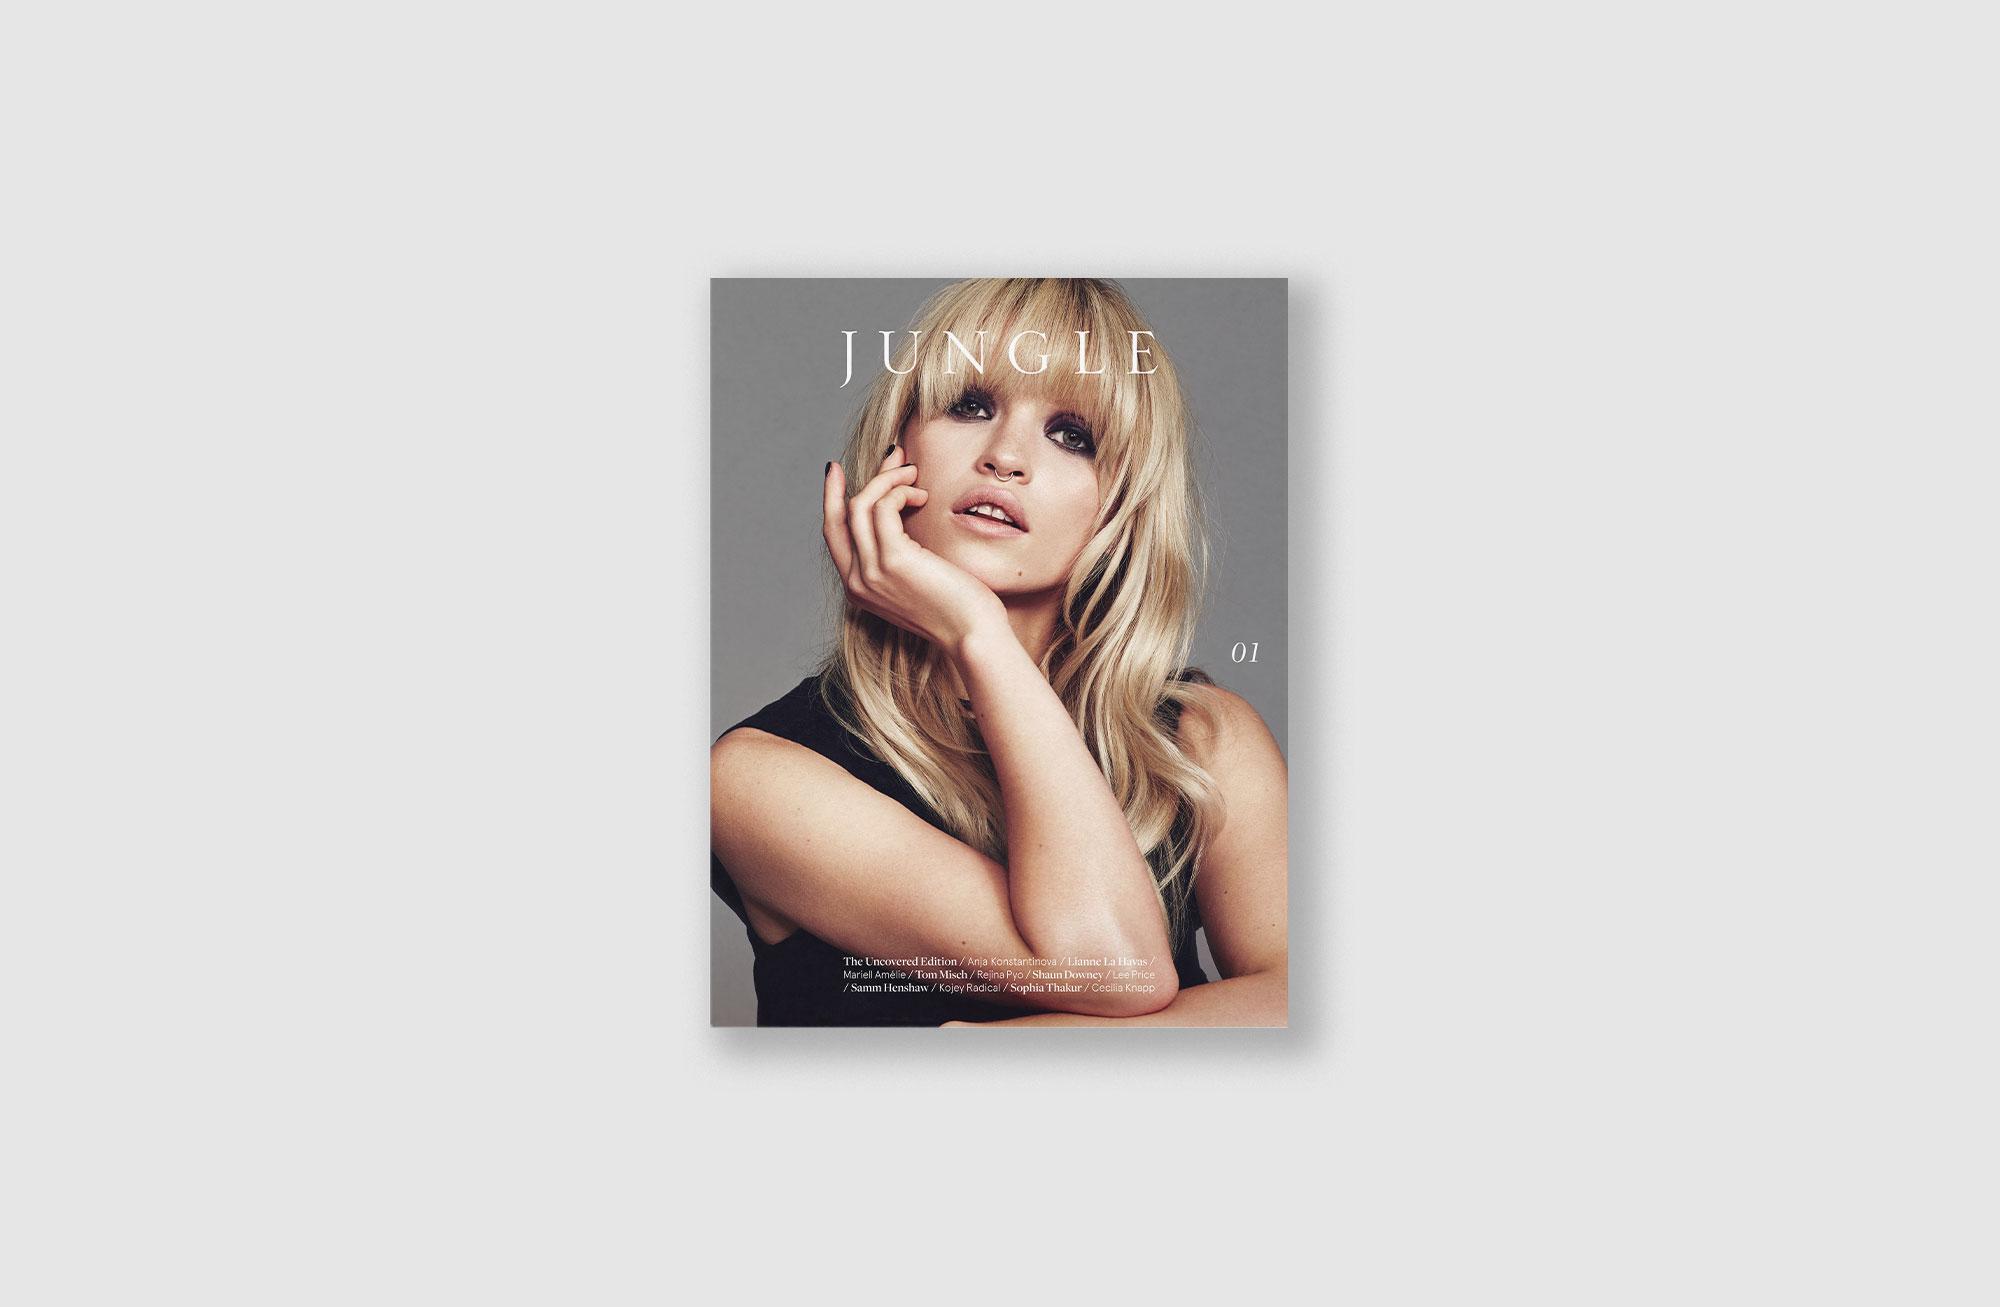 jungle-magazine-01-3.jpg